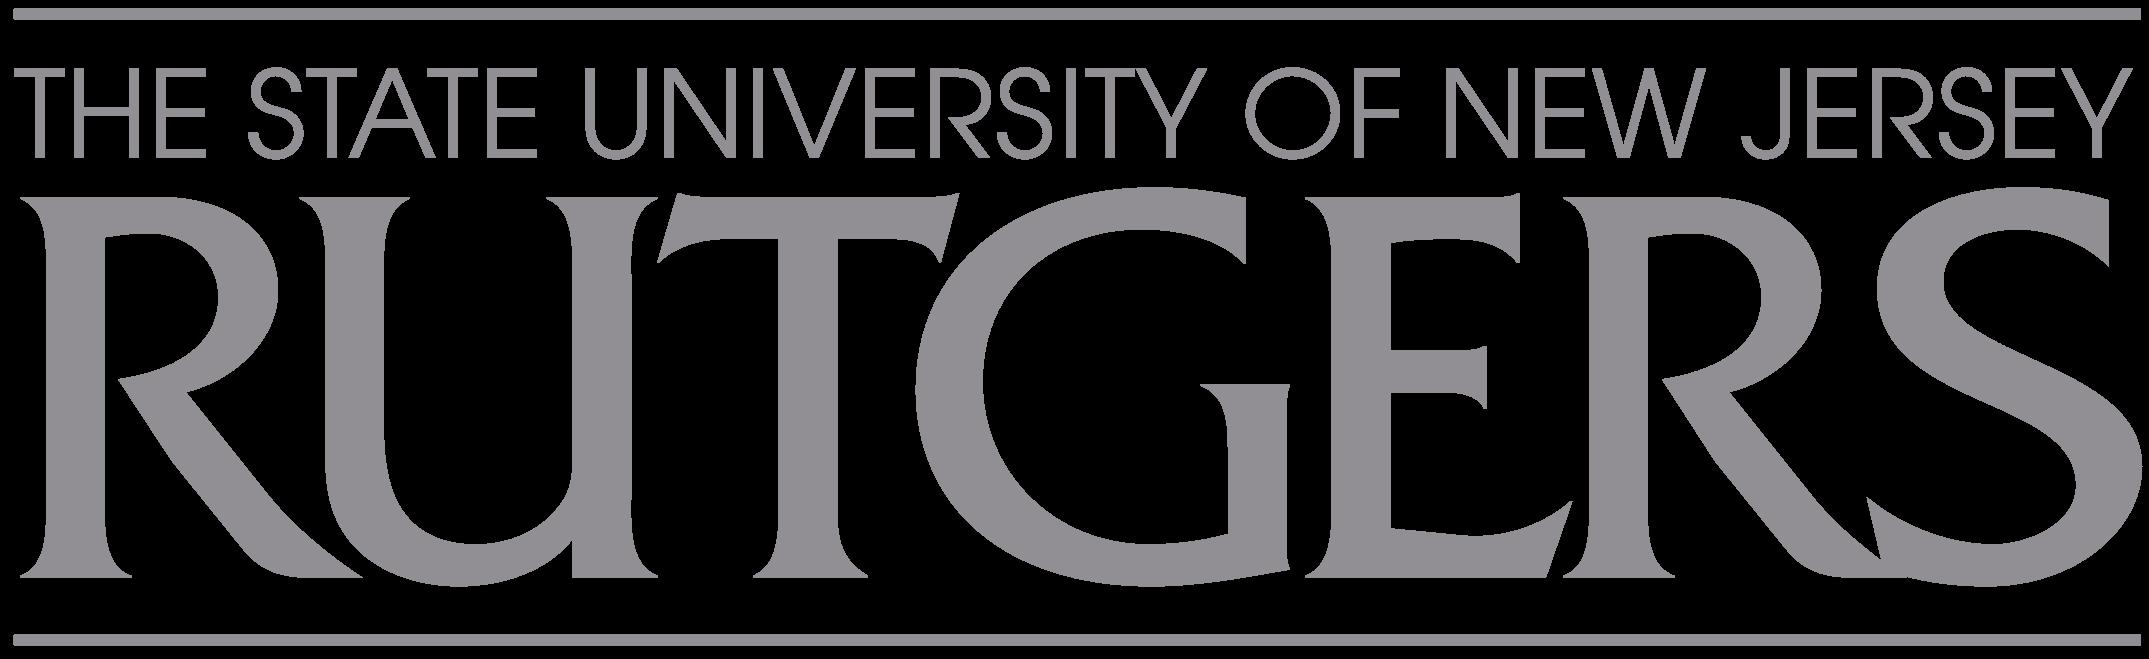 Rutgers-logo-grey